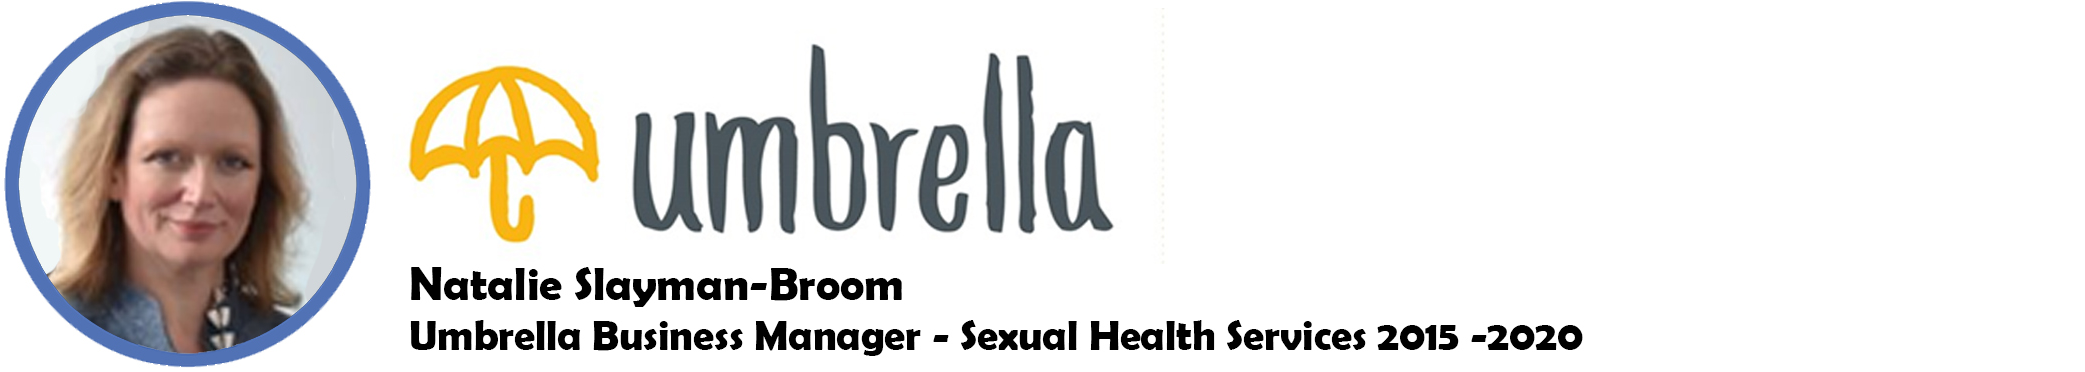 Natalie Slayman Broom - Umbrella Business Manager - Sexual Health Services 2015-2020